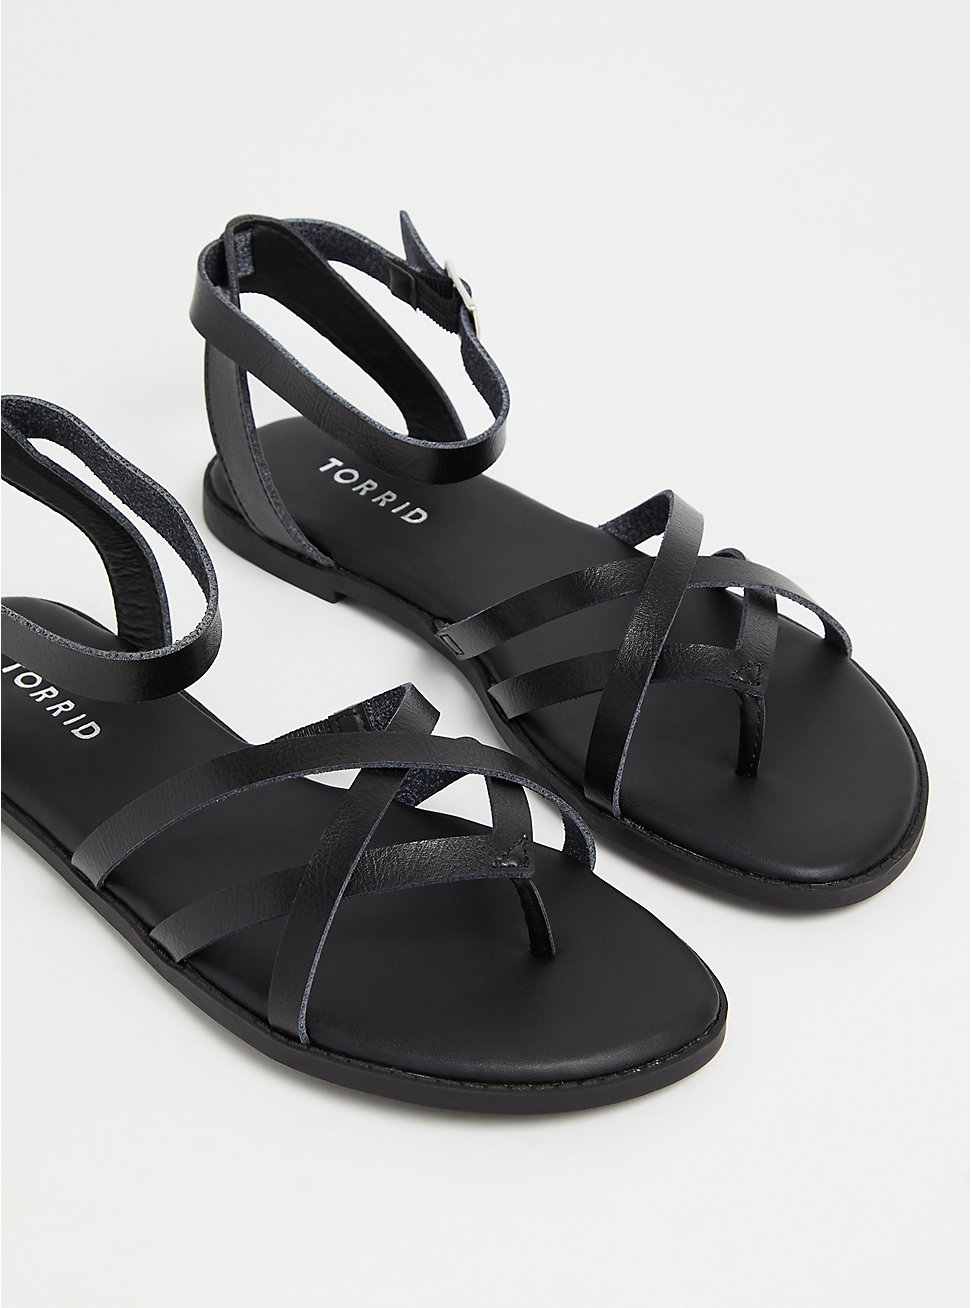 Black Faux Leather Strappy Gladiator Sandal (WW), BLACK, hi-res